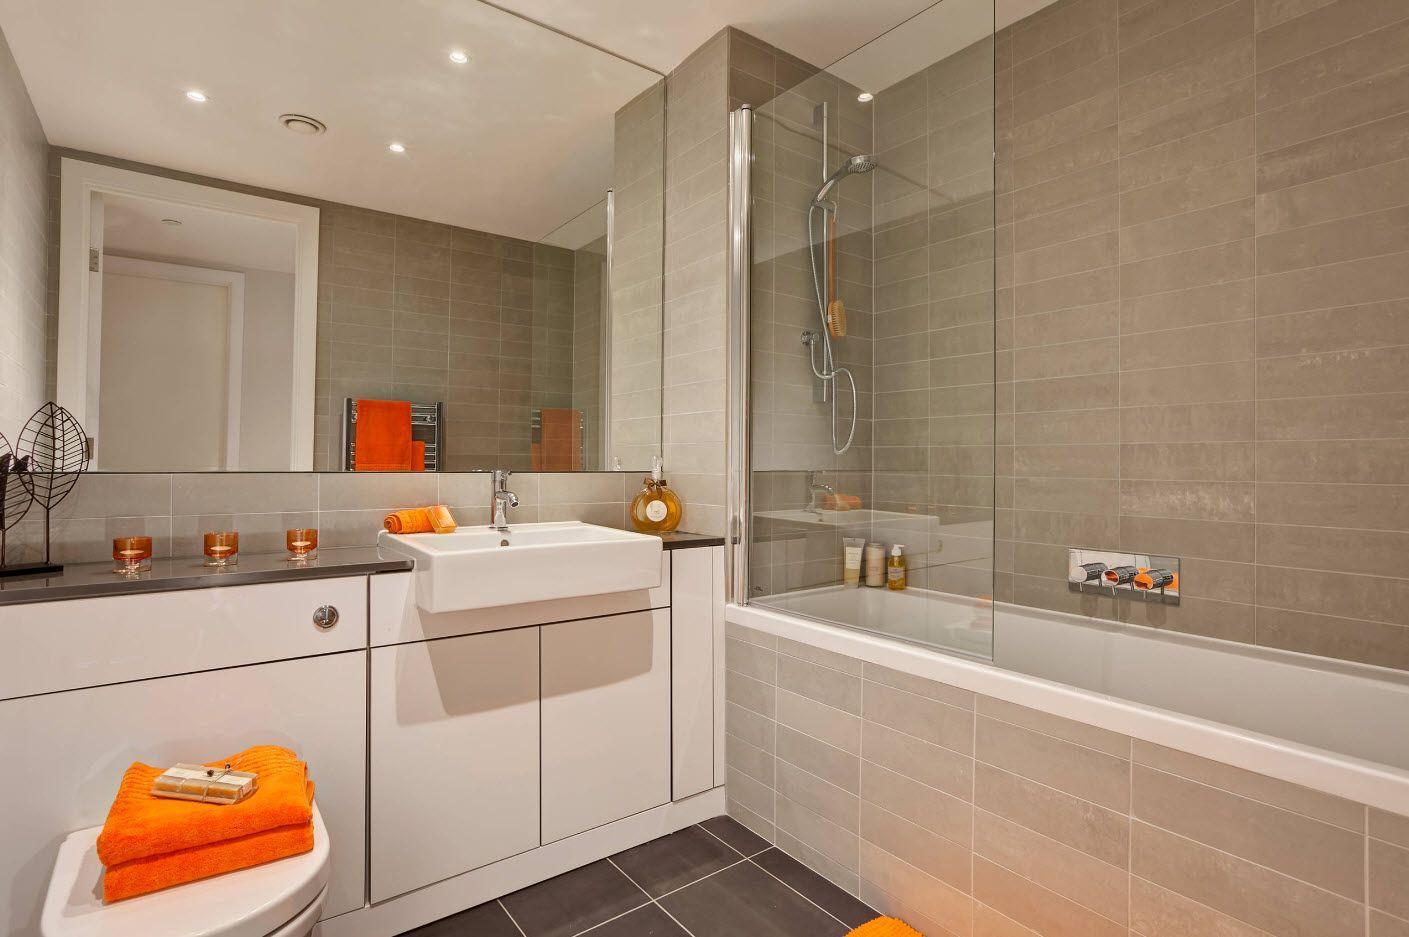 Small Bathroom Interior Space Optimization Ideas & Layout Photos 2017 grayish decoration